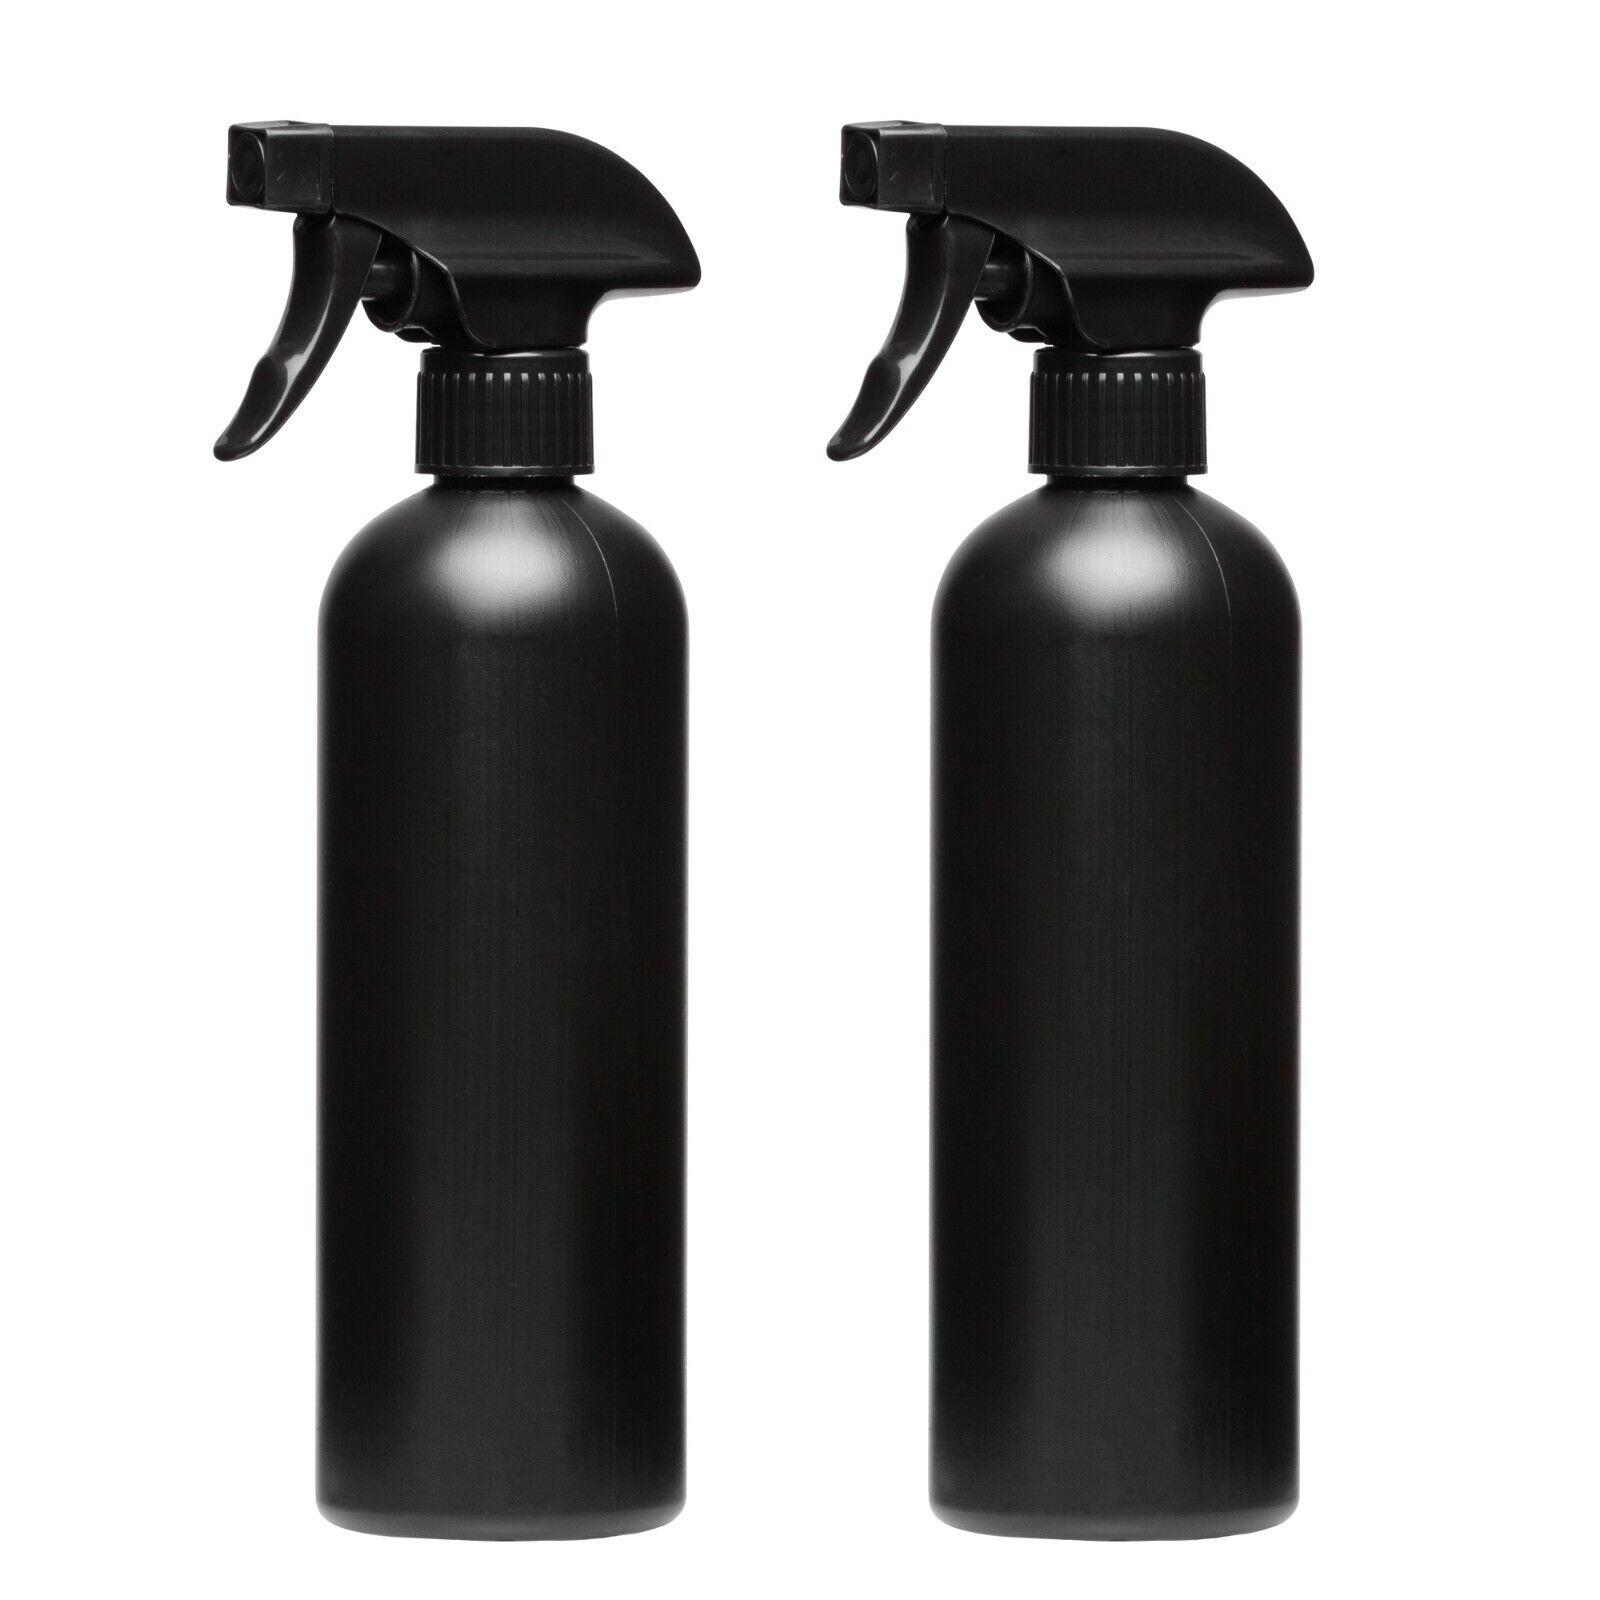 2 x 500ml Black Plastic Spray Bottle Water Sprayer Cleaning Garden Hair Salon